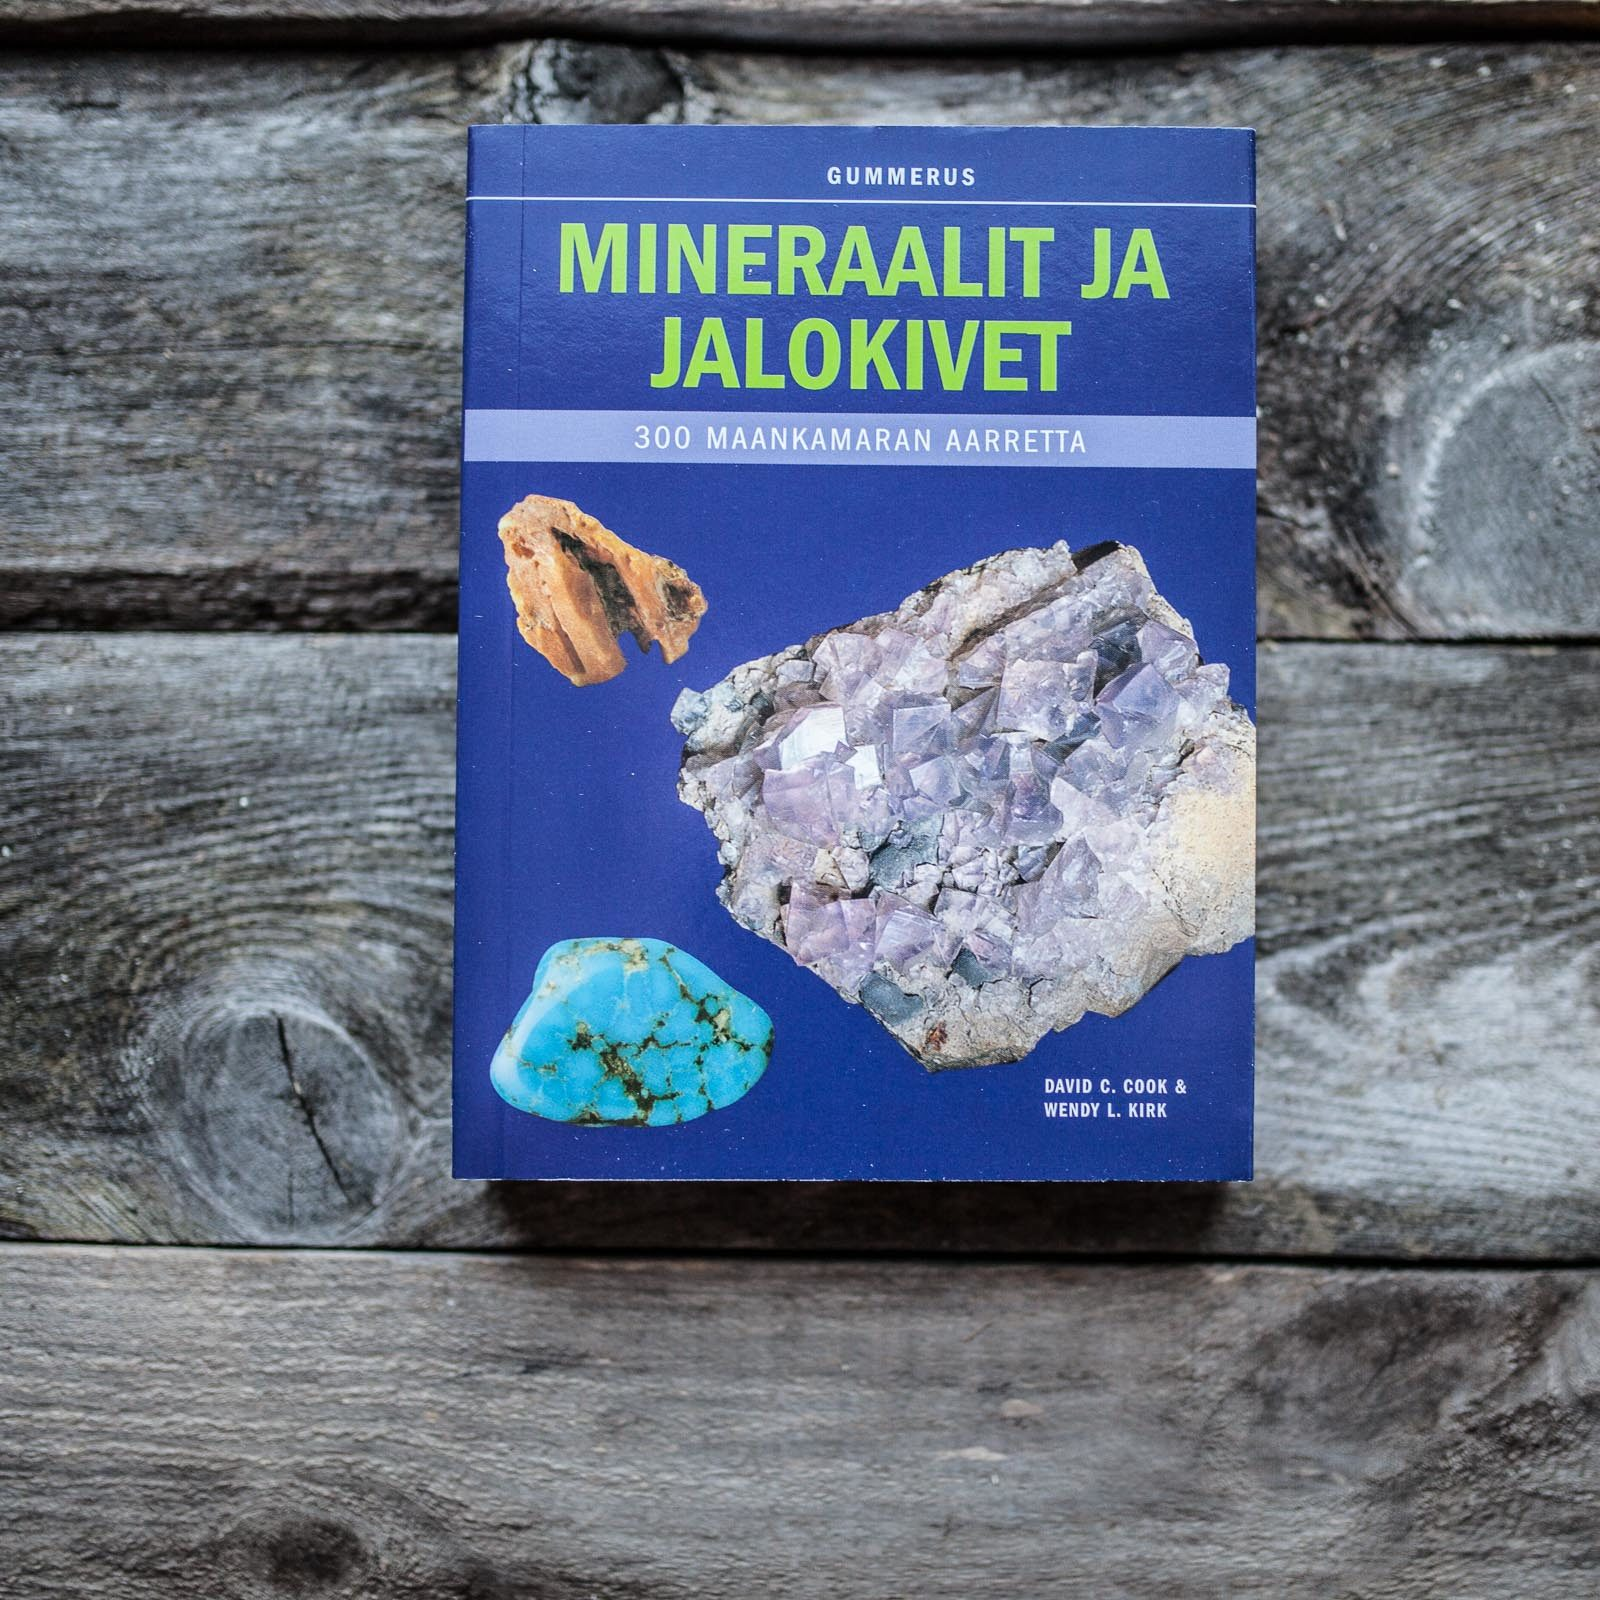 Mineraalit ja jalokivet - 300 maankamaran aarretta